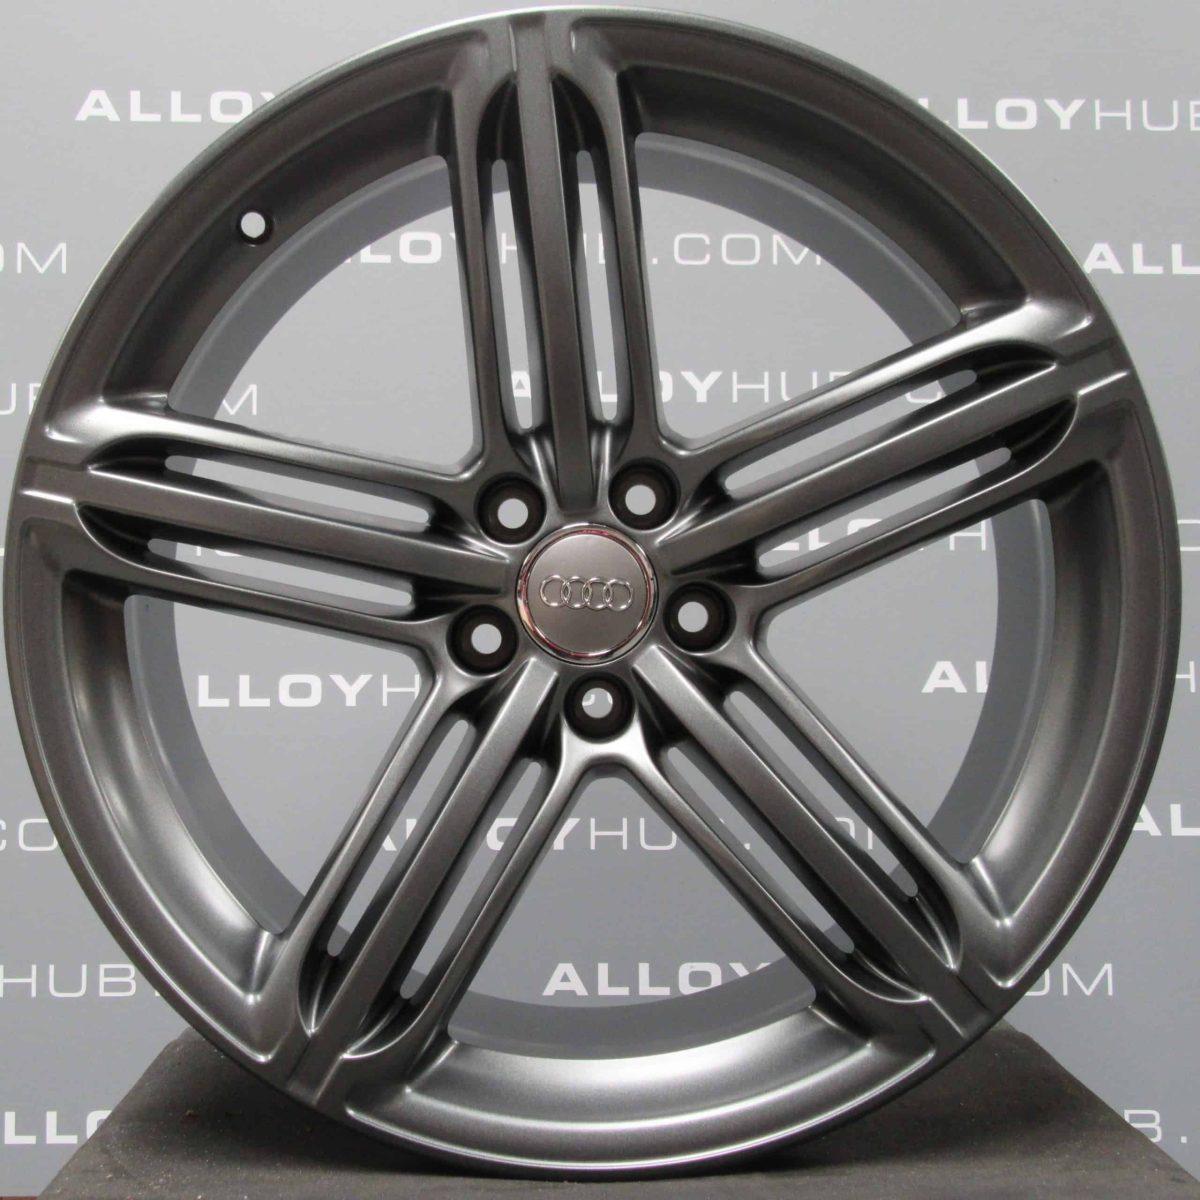 "Genuine Audi Q5 8R S-line Black Edition 5 Segment Spoke 20"" inch Alloy Wheels with Titanium Grey Finish 8R0 601 025 BG"